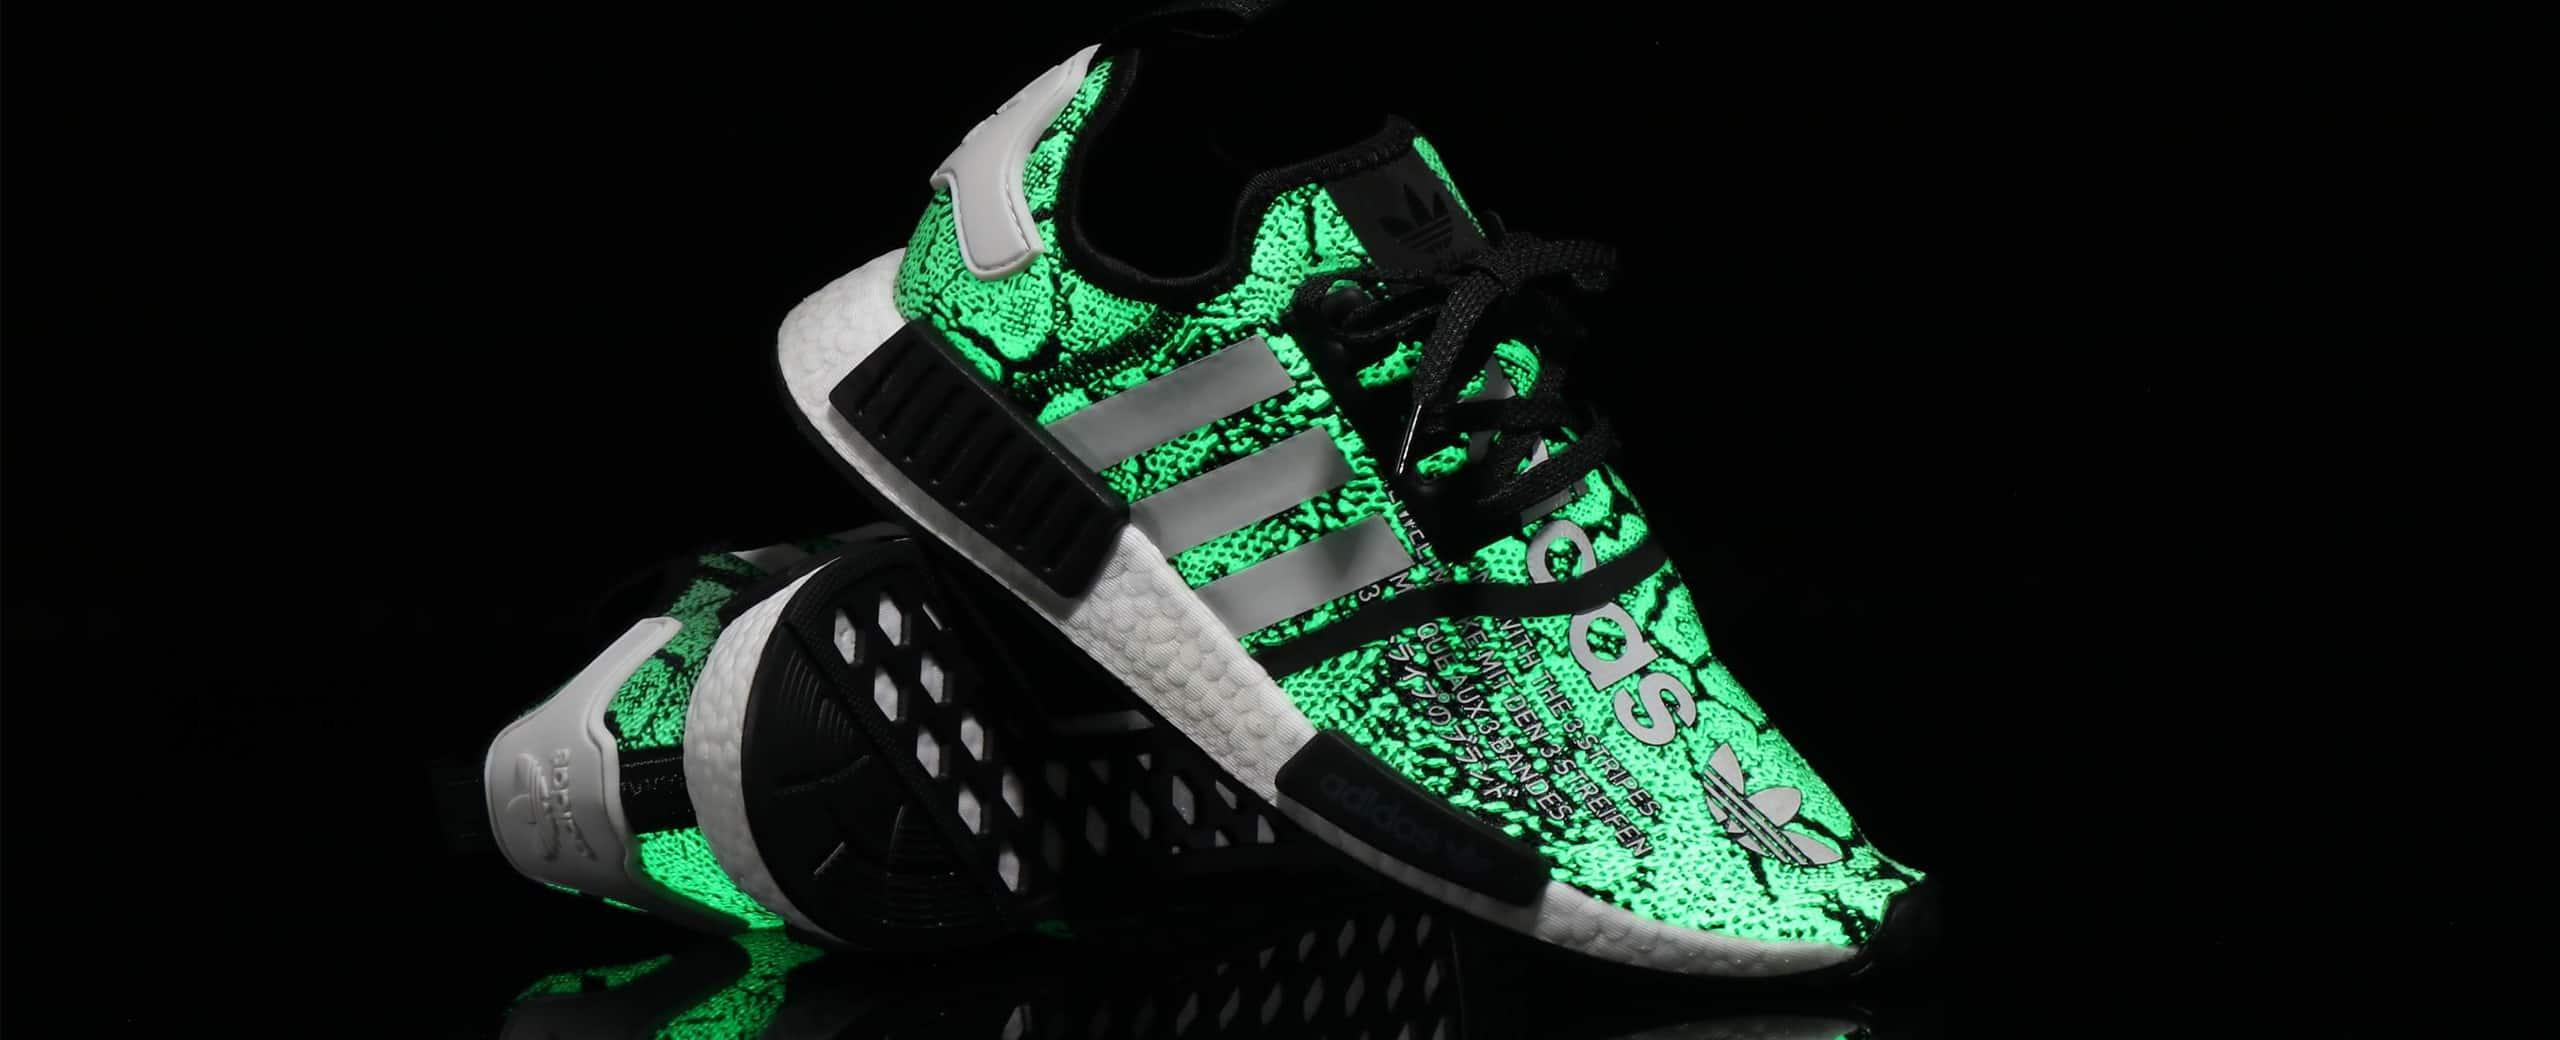 Adidas NMD R1 Atmos G Snk